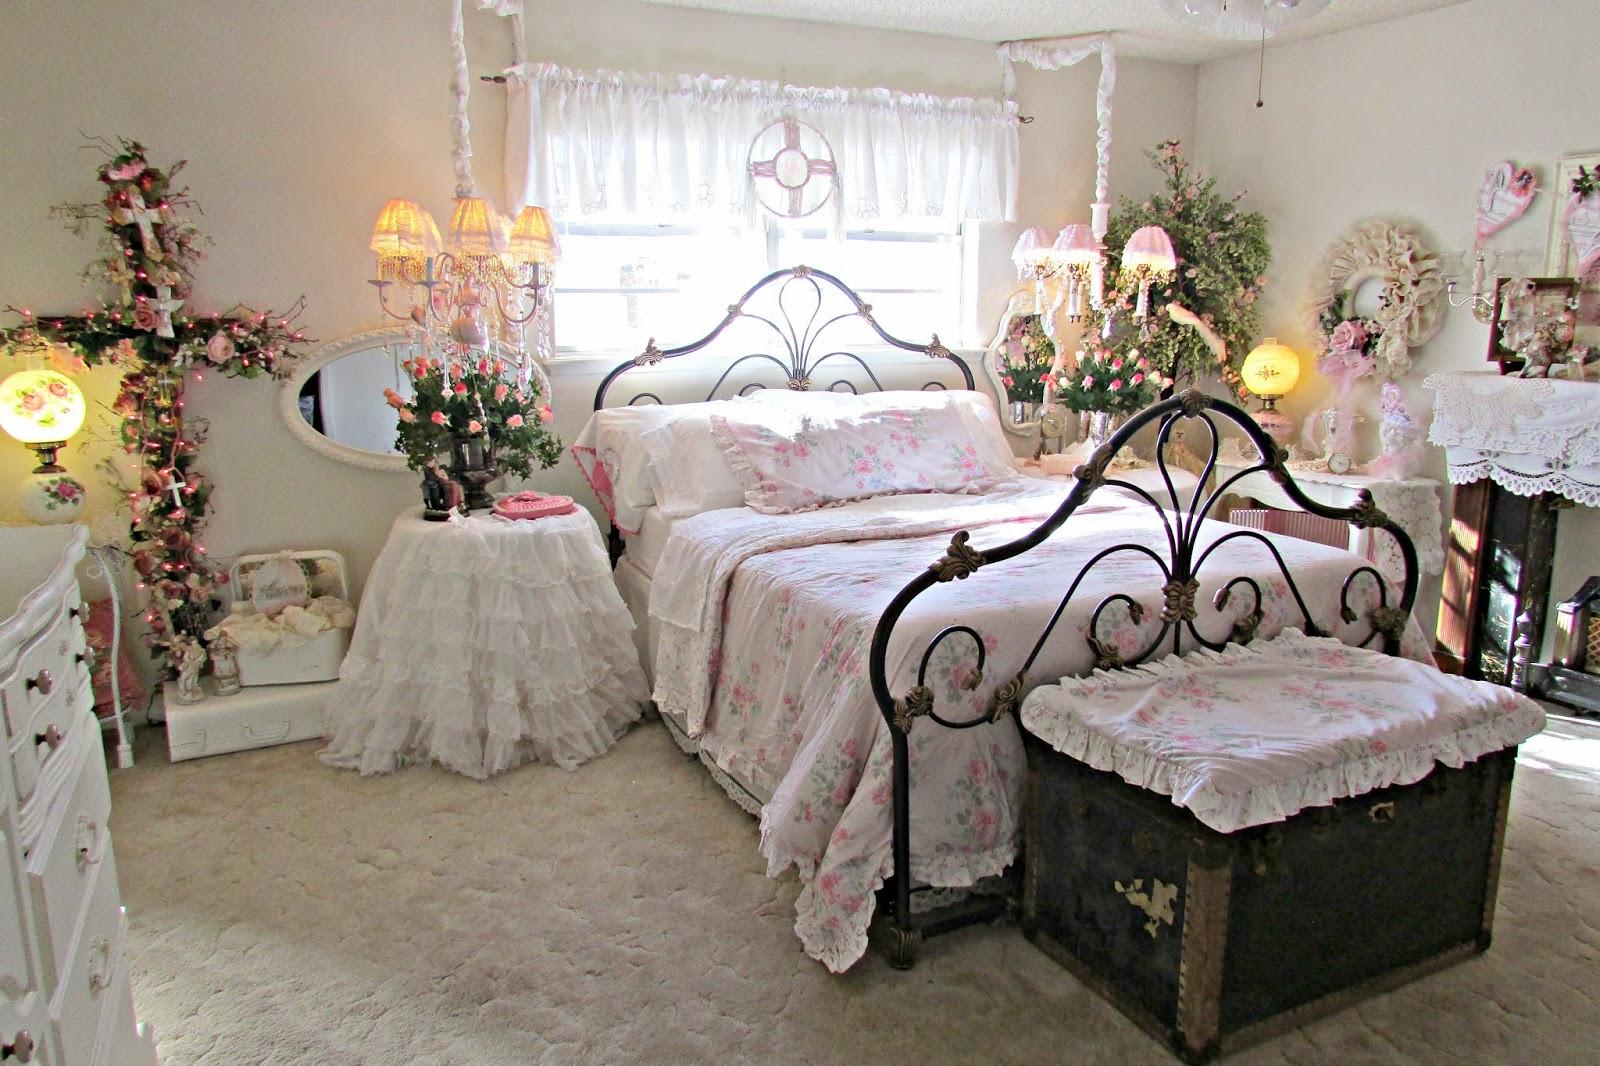 Romantic Bedroom Decor Ideas  Penny s Vintage Home Romantic Ideas for Decorating your